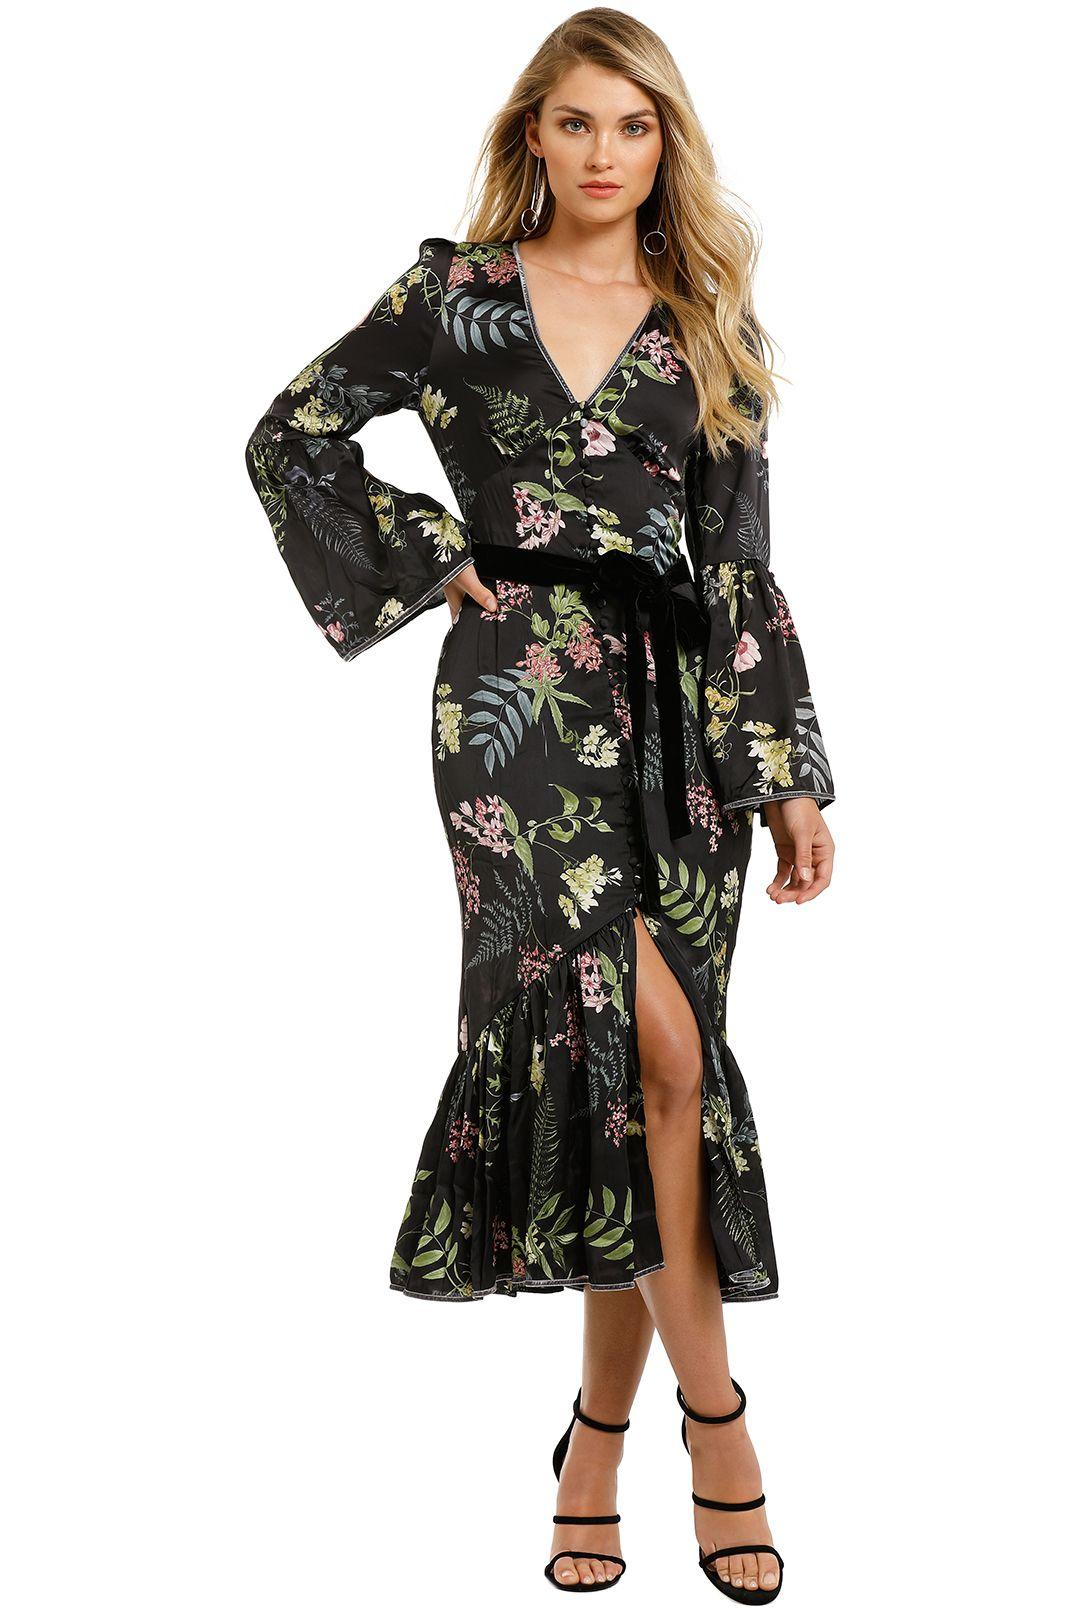 We-Are-Kindred-Eloise-Button-Through-Dress-Black-Delphinium-Front